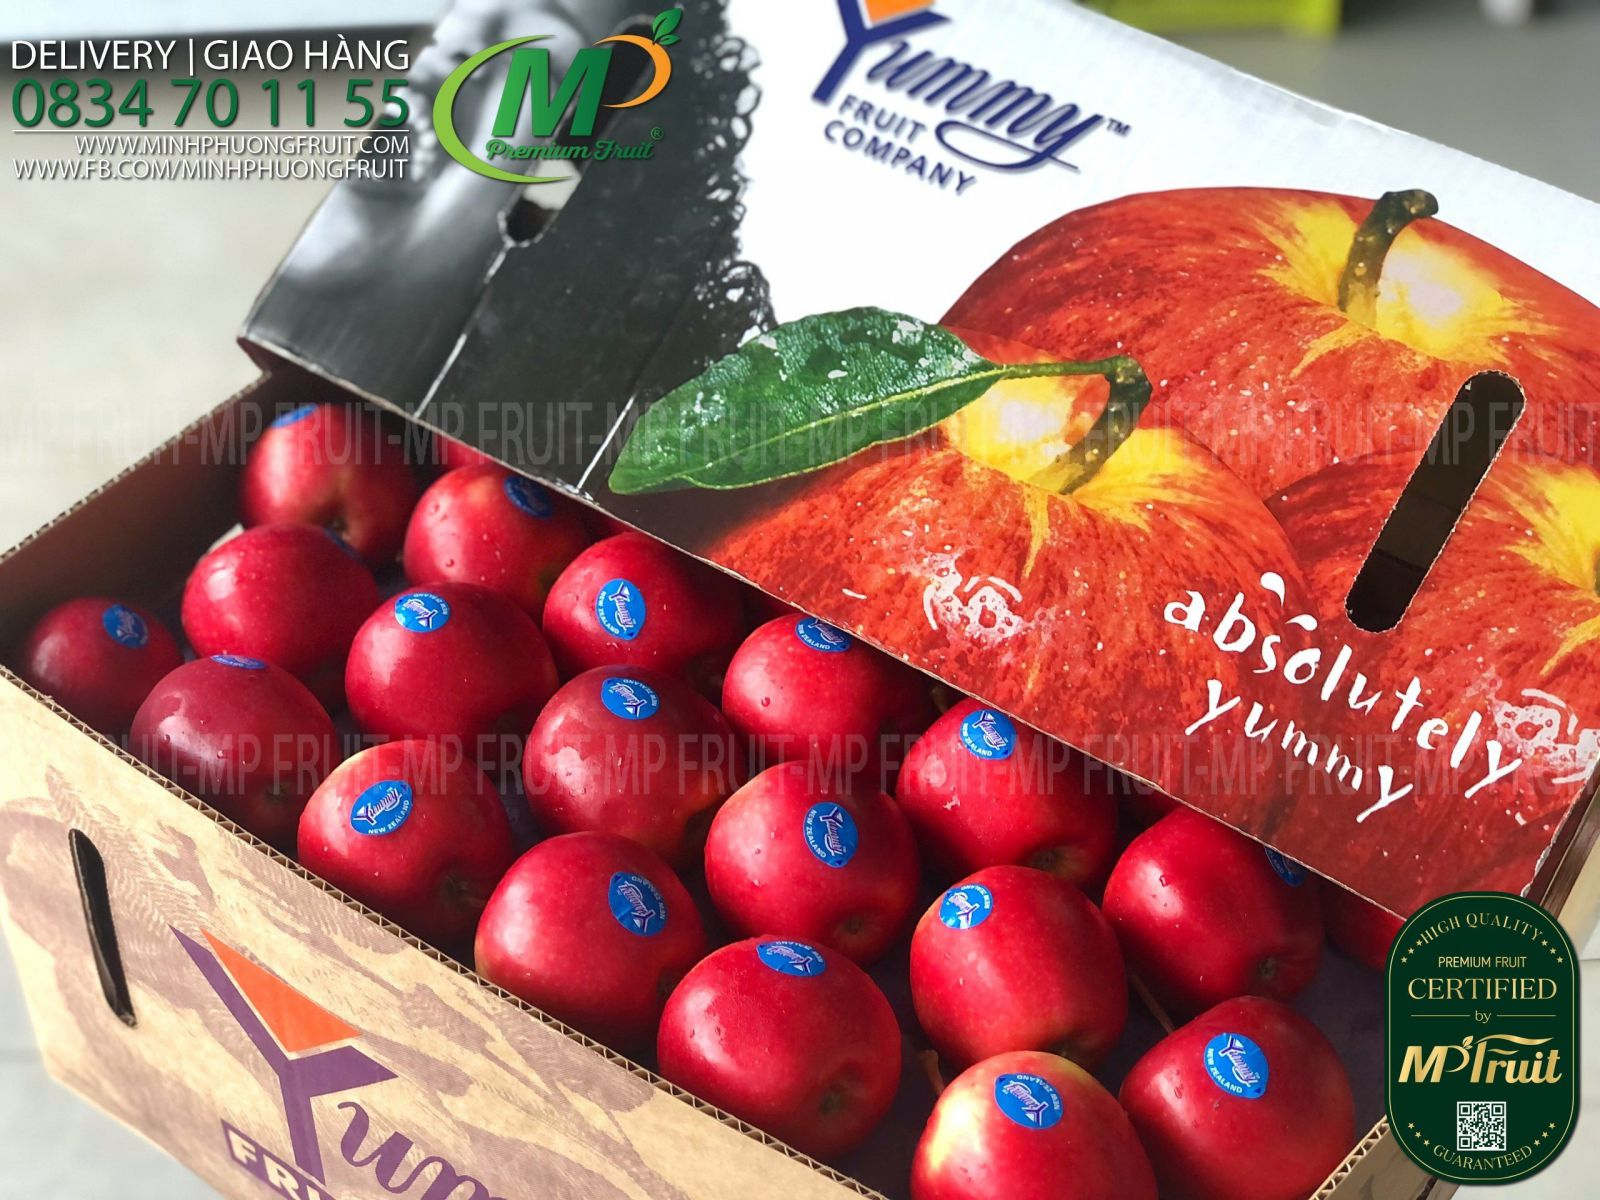 Táo Queen New Zealand | Yummy™ tại MP Fruit